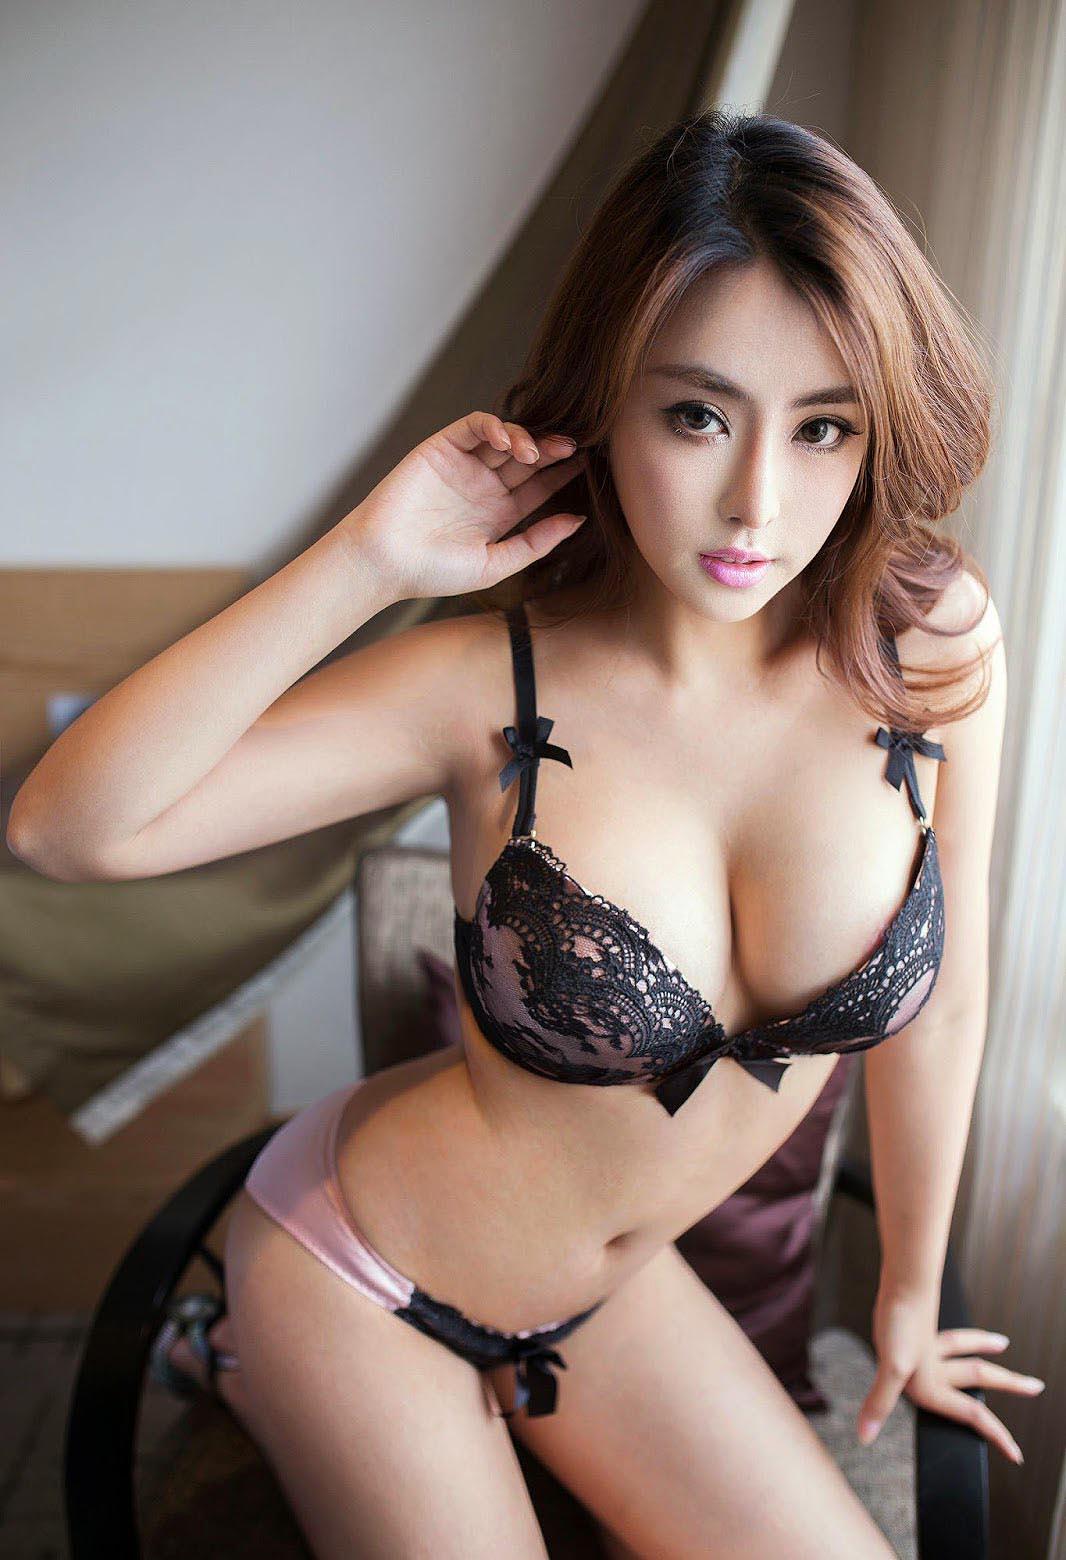 asian hot gallery women